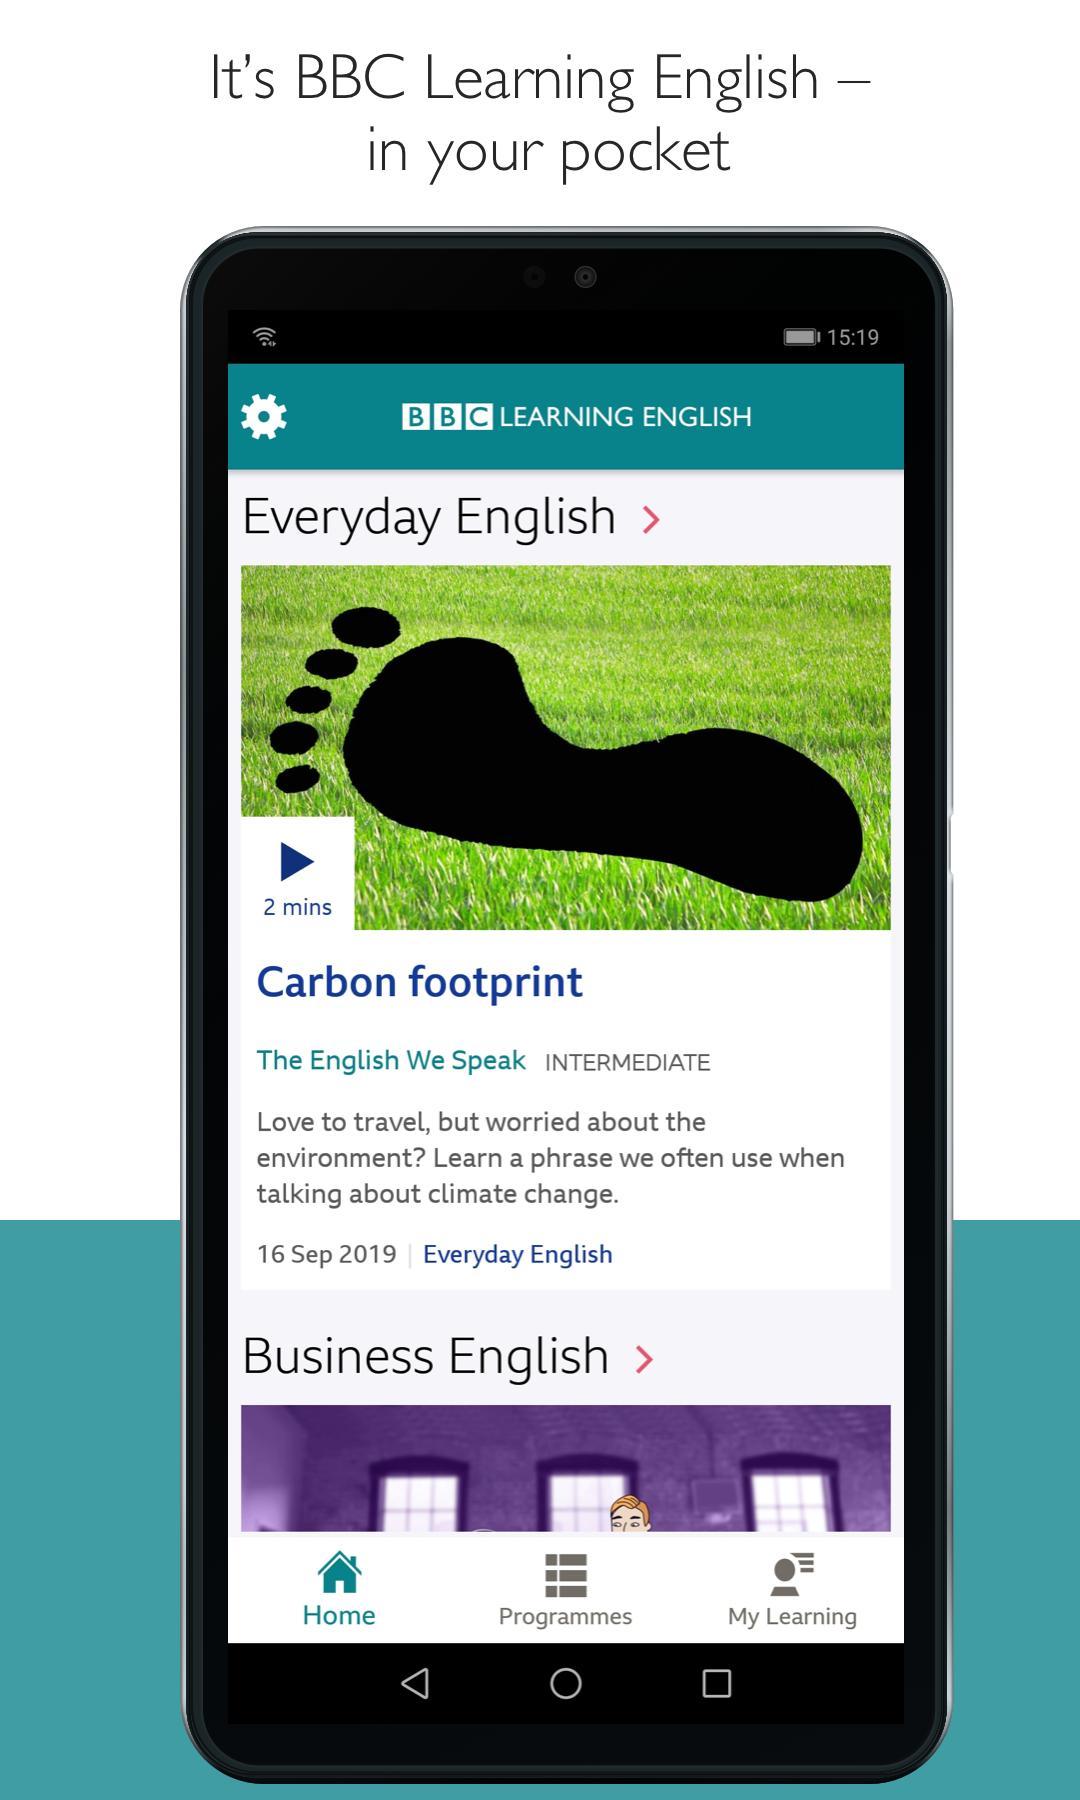 BBC Learning English 1.2.1 Screenshot 1